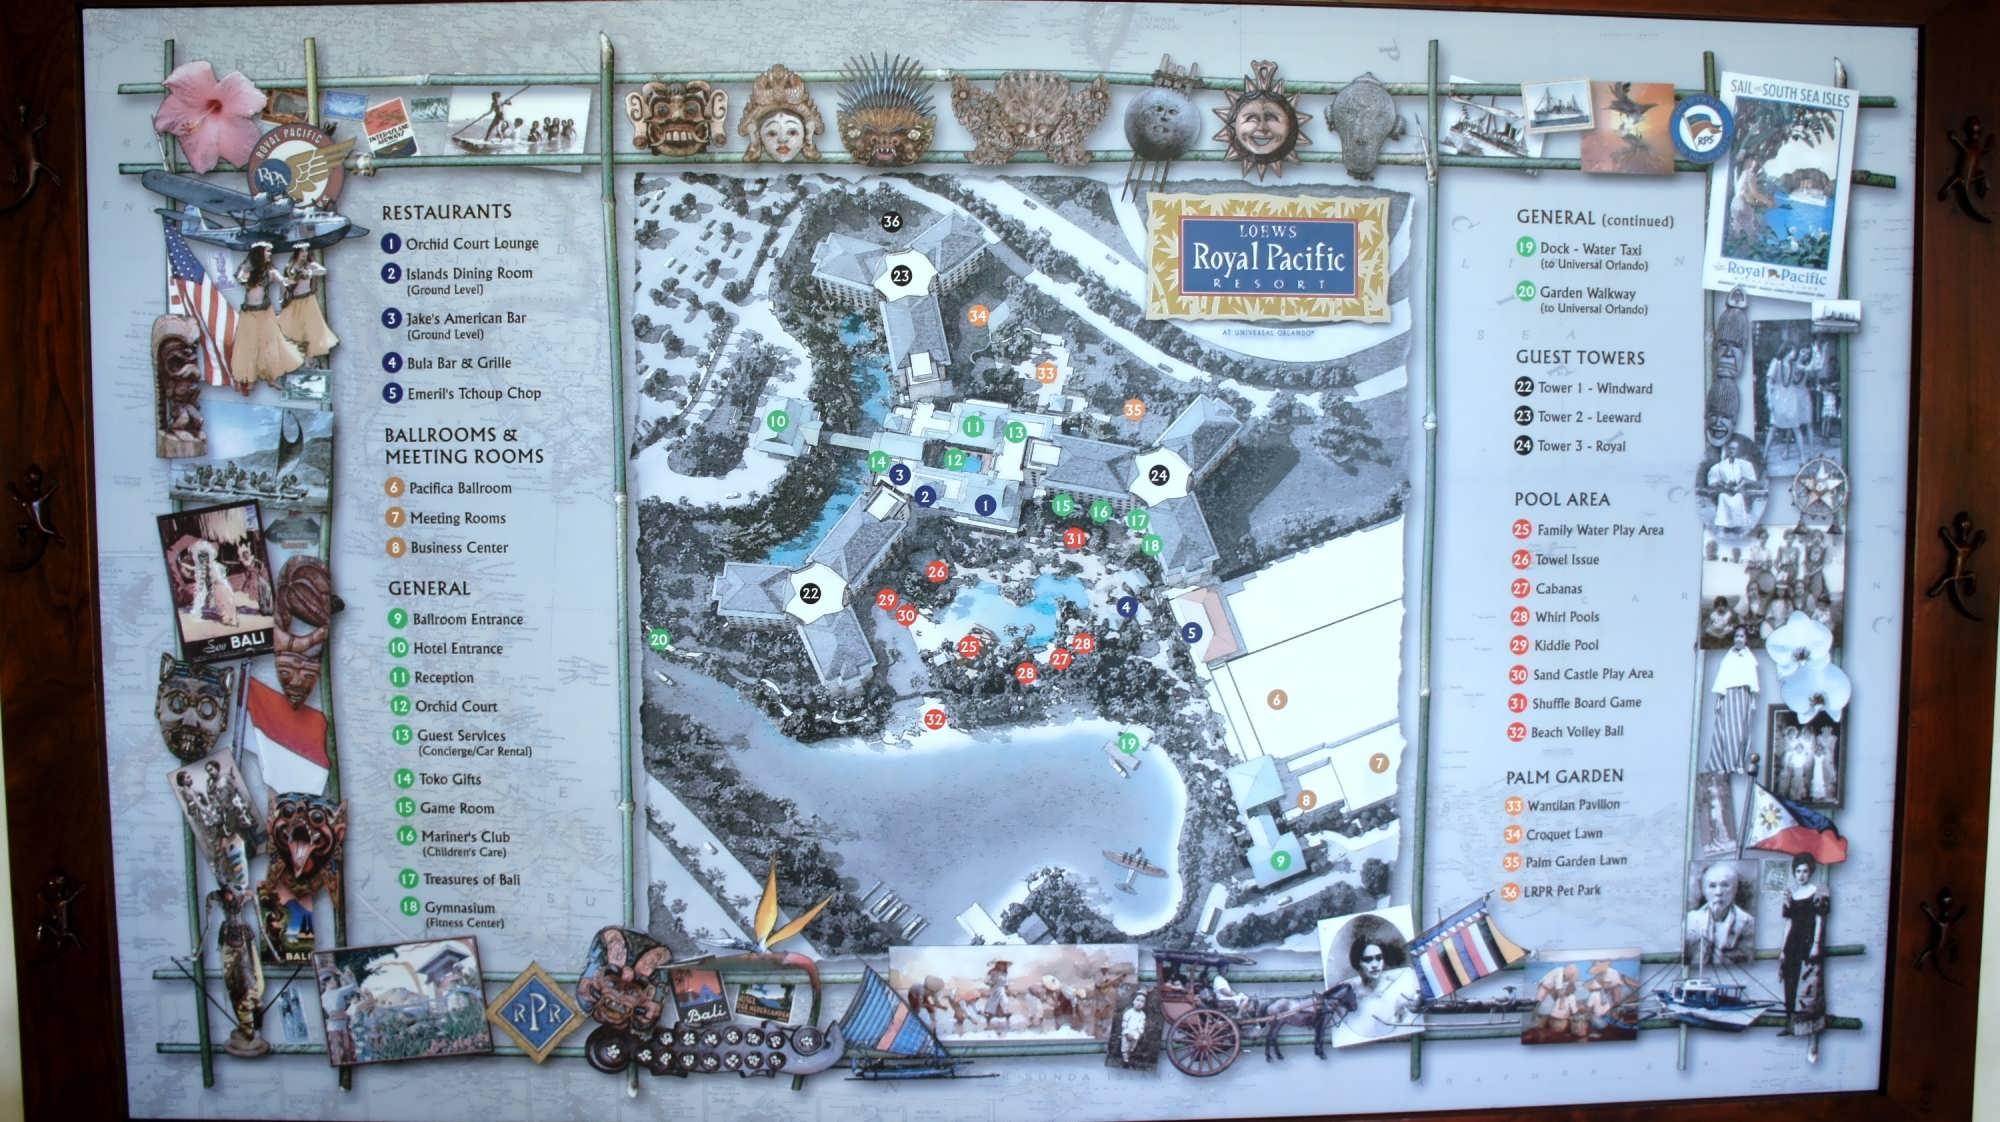 Royal Pacific Resort map